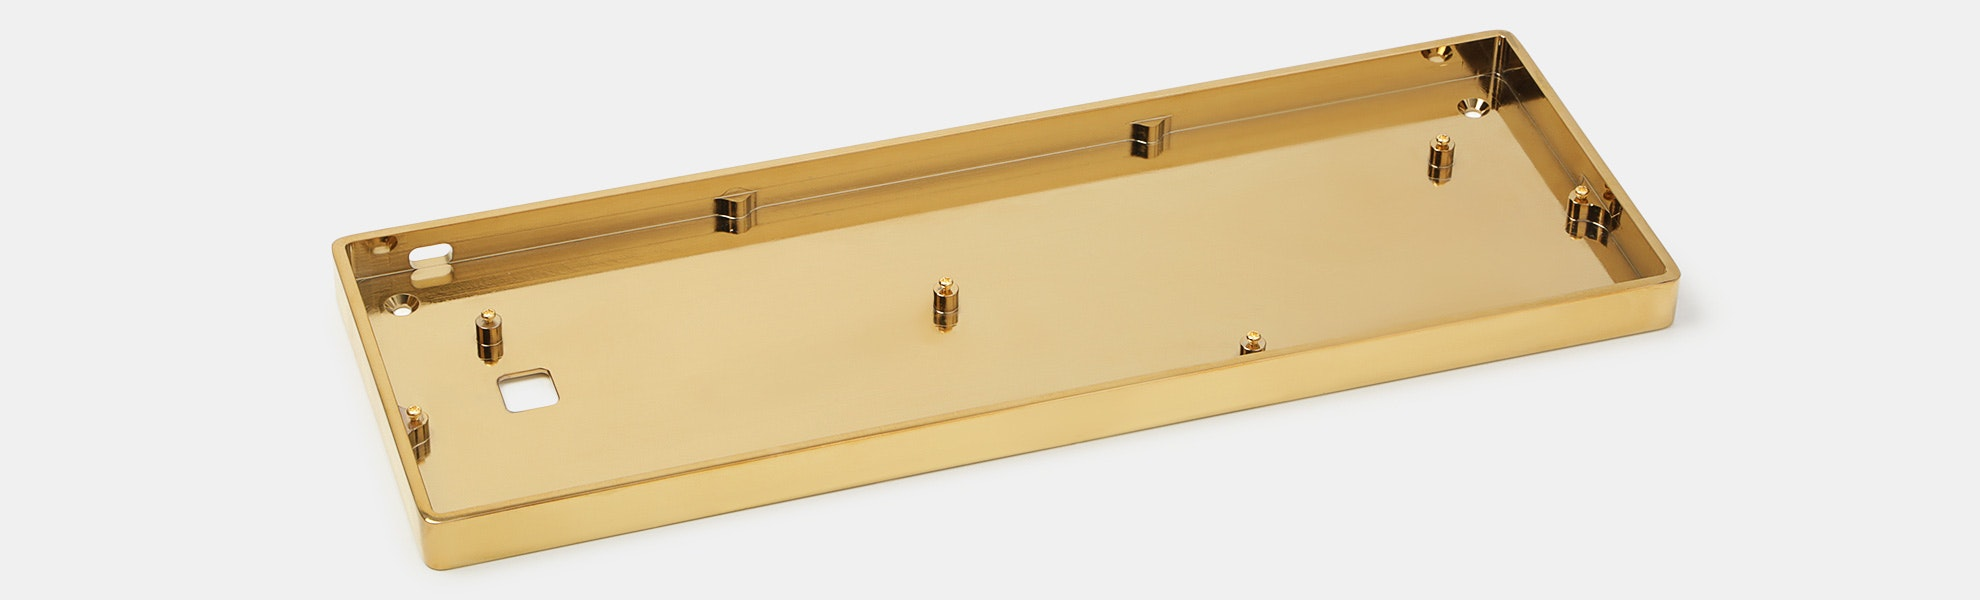 GH60 100% Bronze Mini Keyboard Case